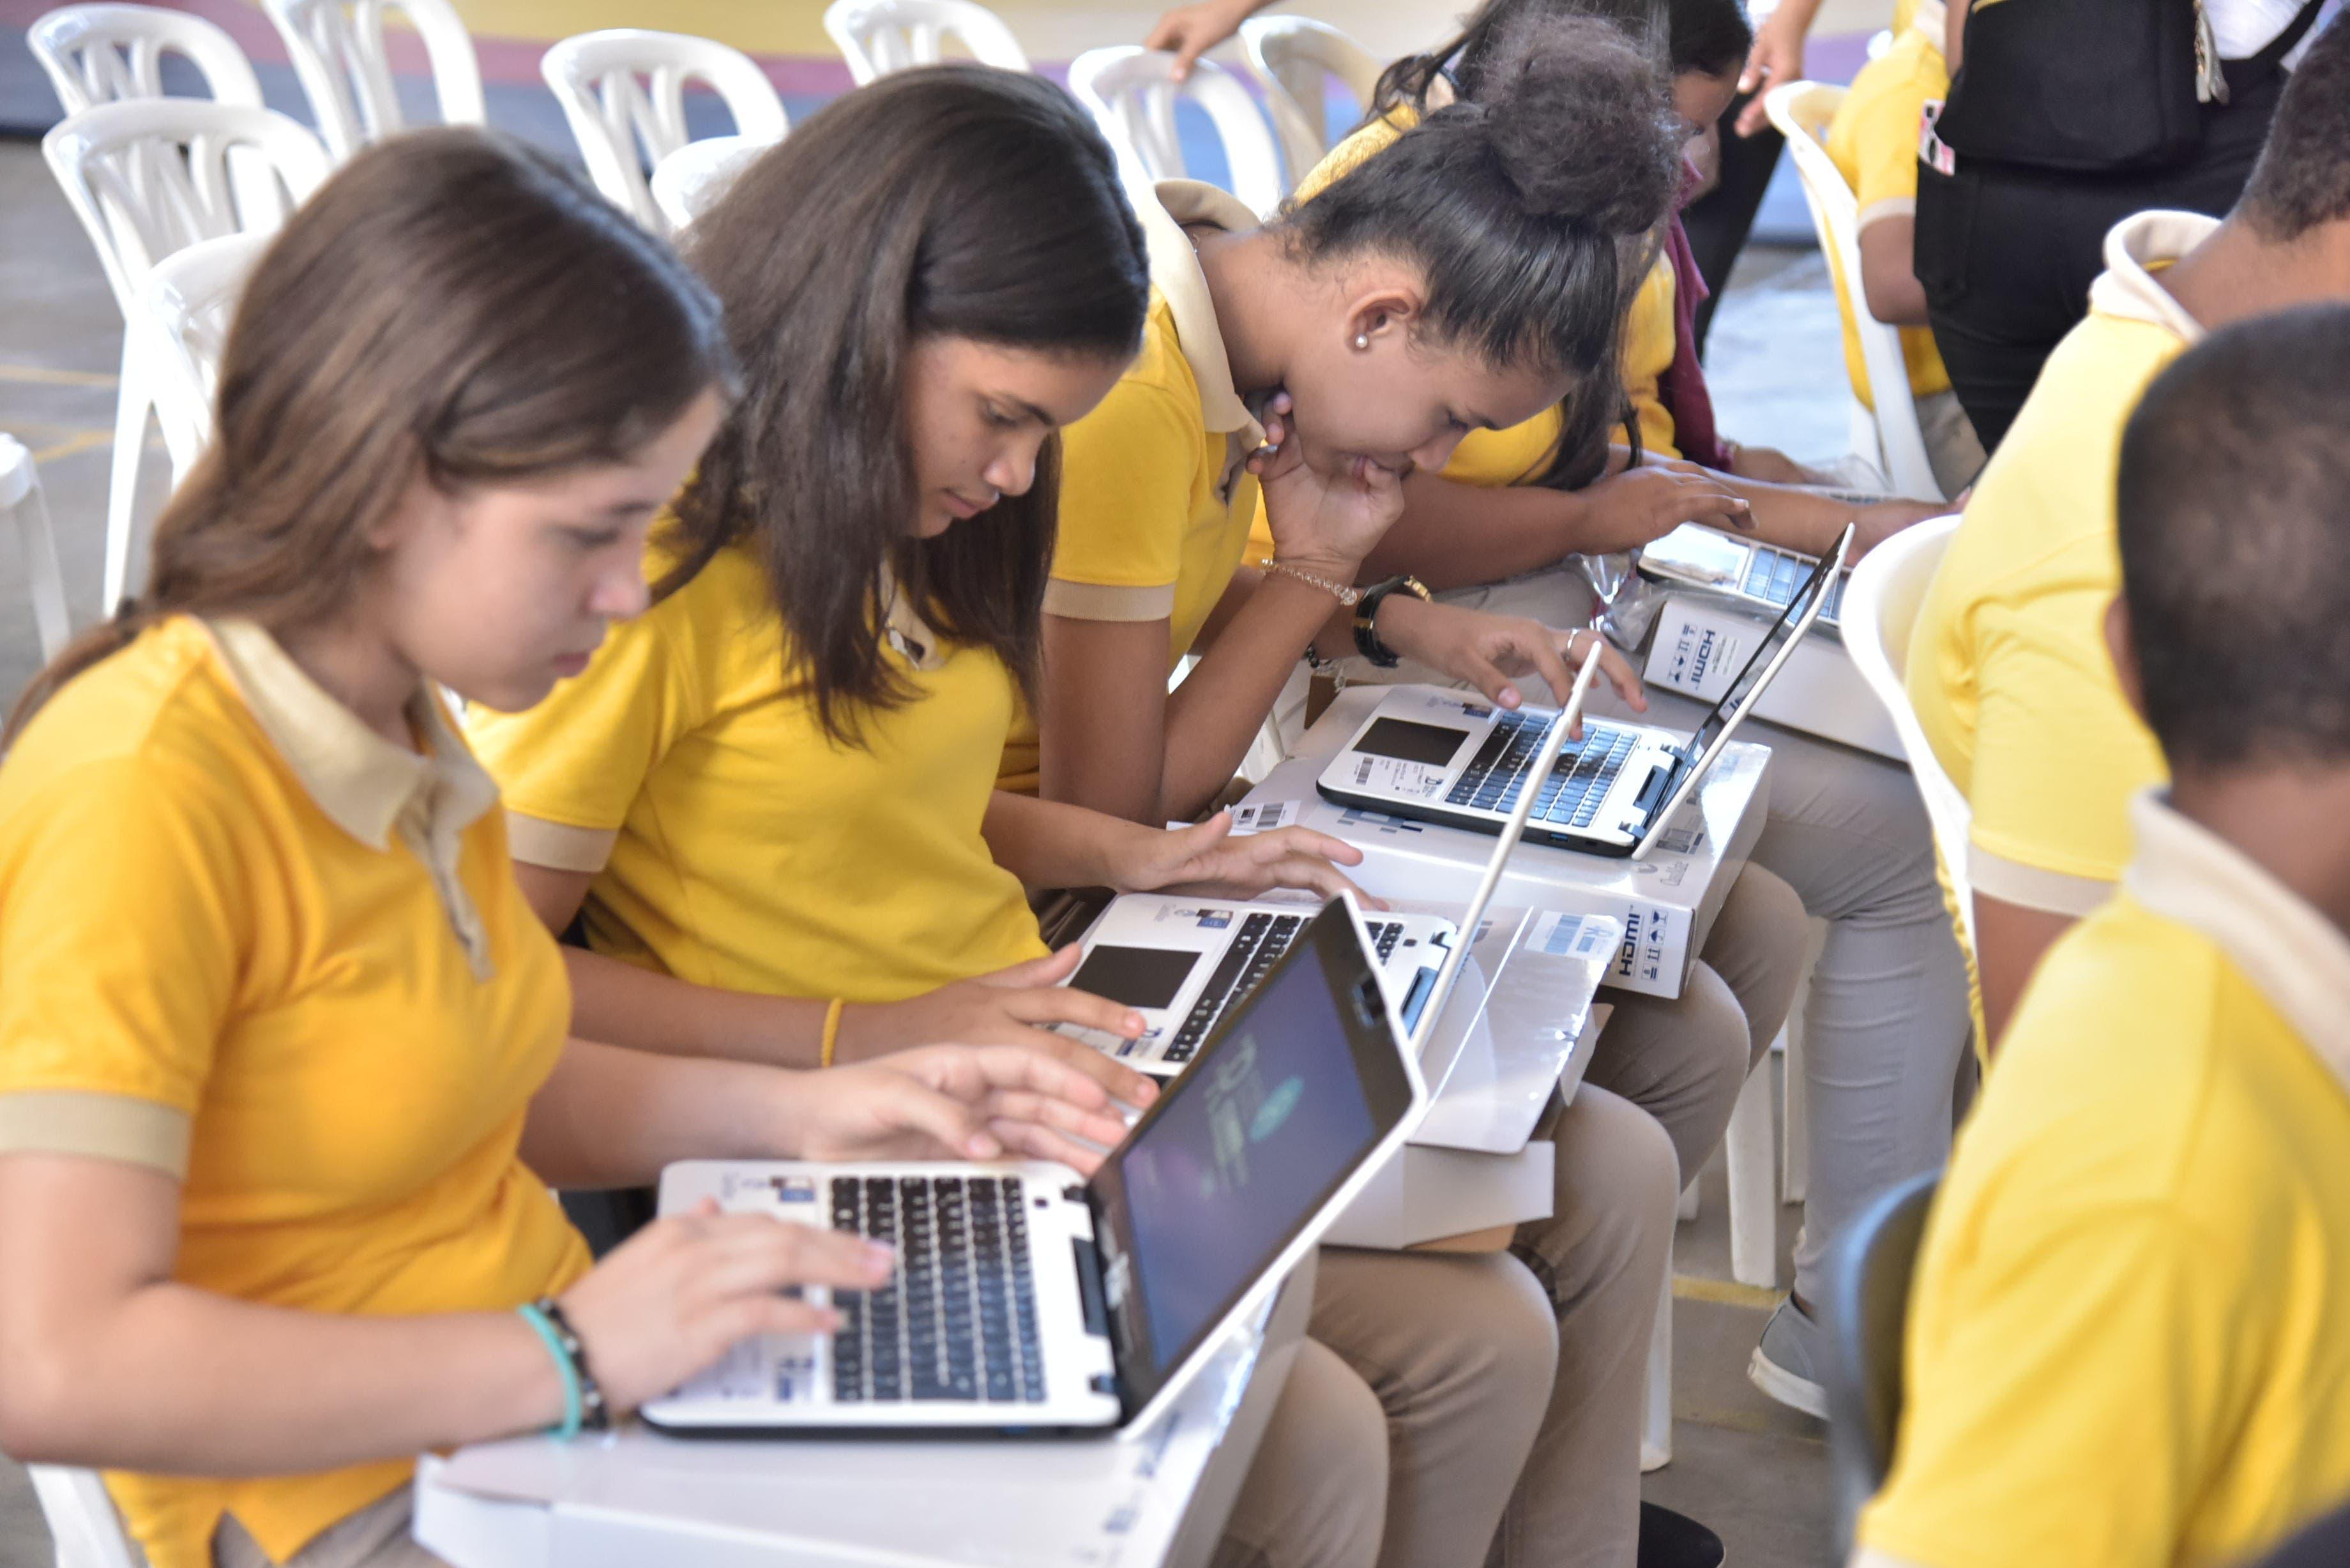 Minerd inicia entrega de computadoras a estudiantes de la Regional 09 en Valverde